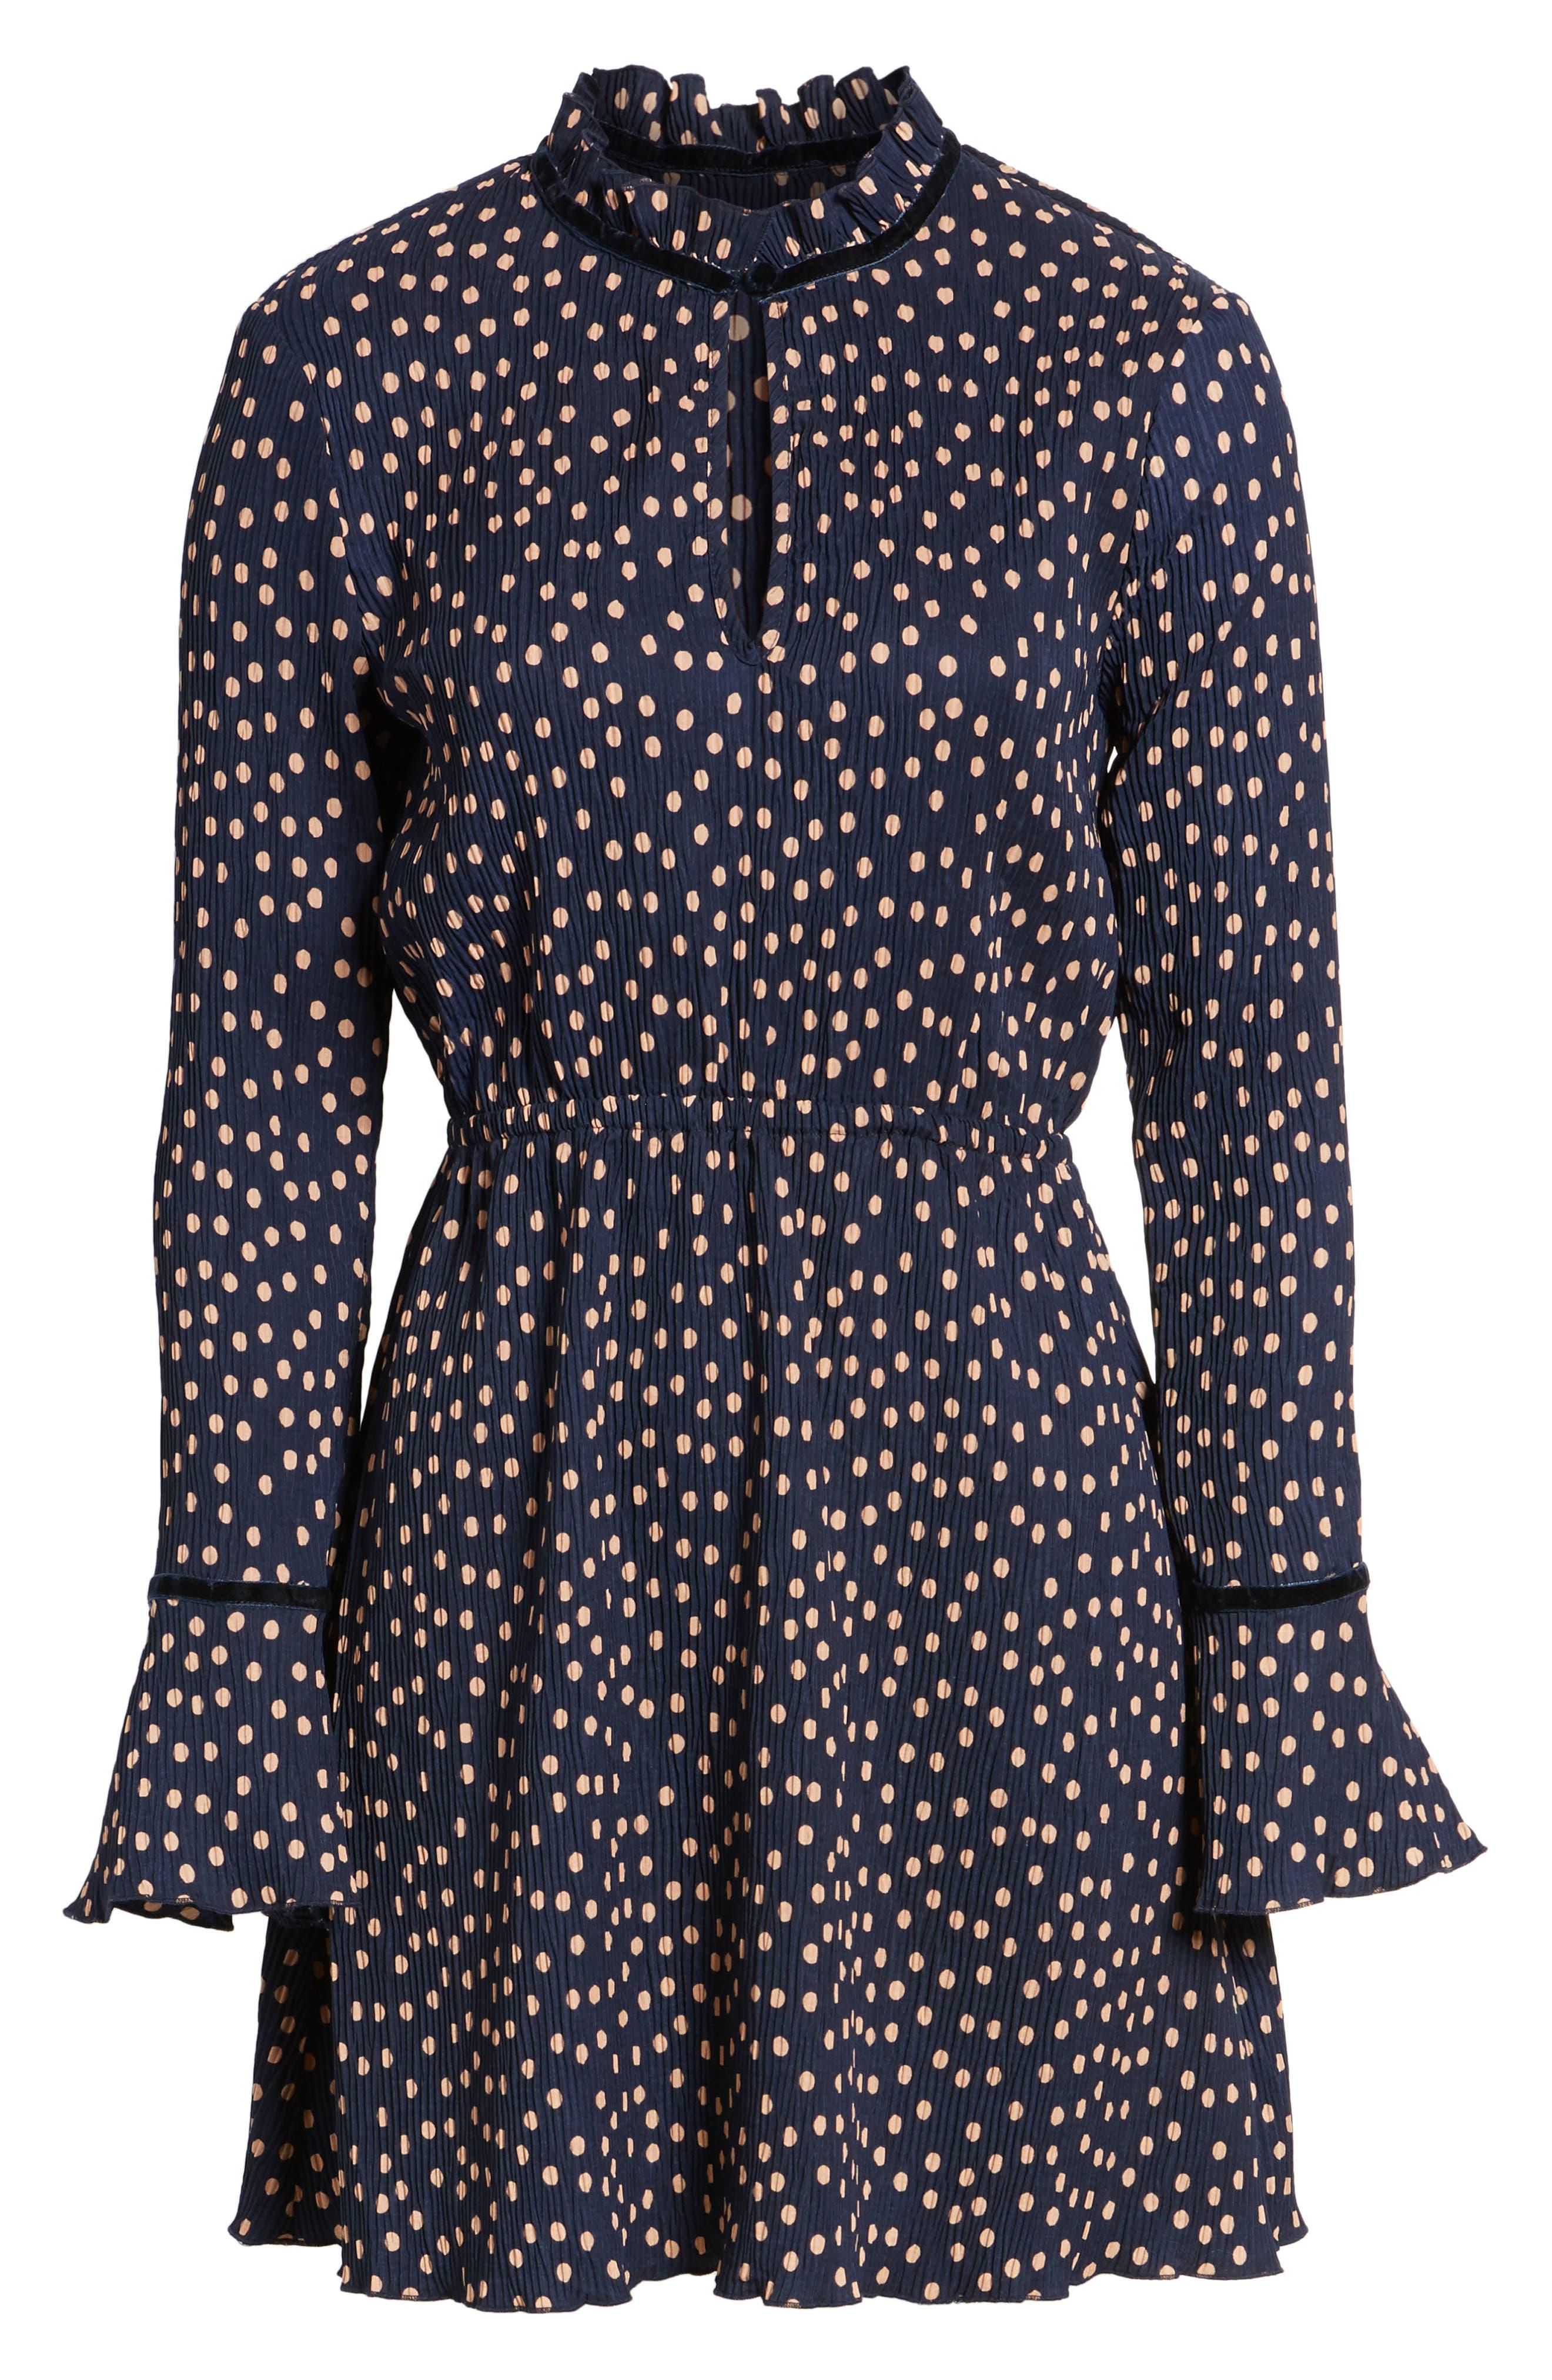 Atlanta Dress,                             Alternate thumbnail 7, color,                             Navy W Peach